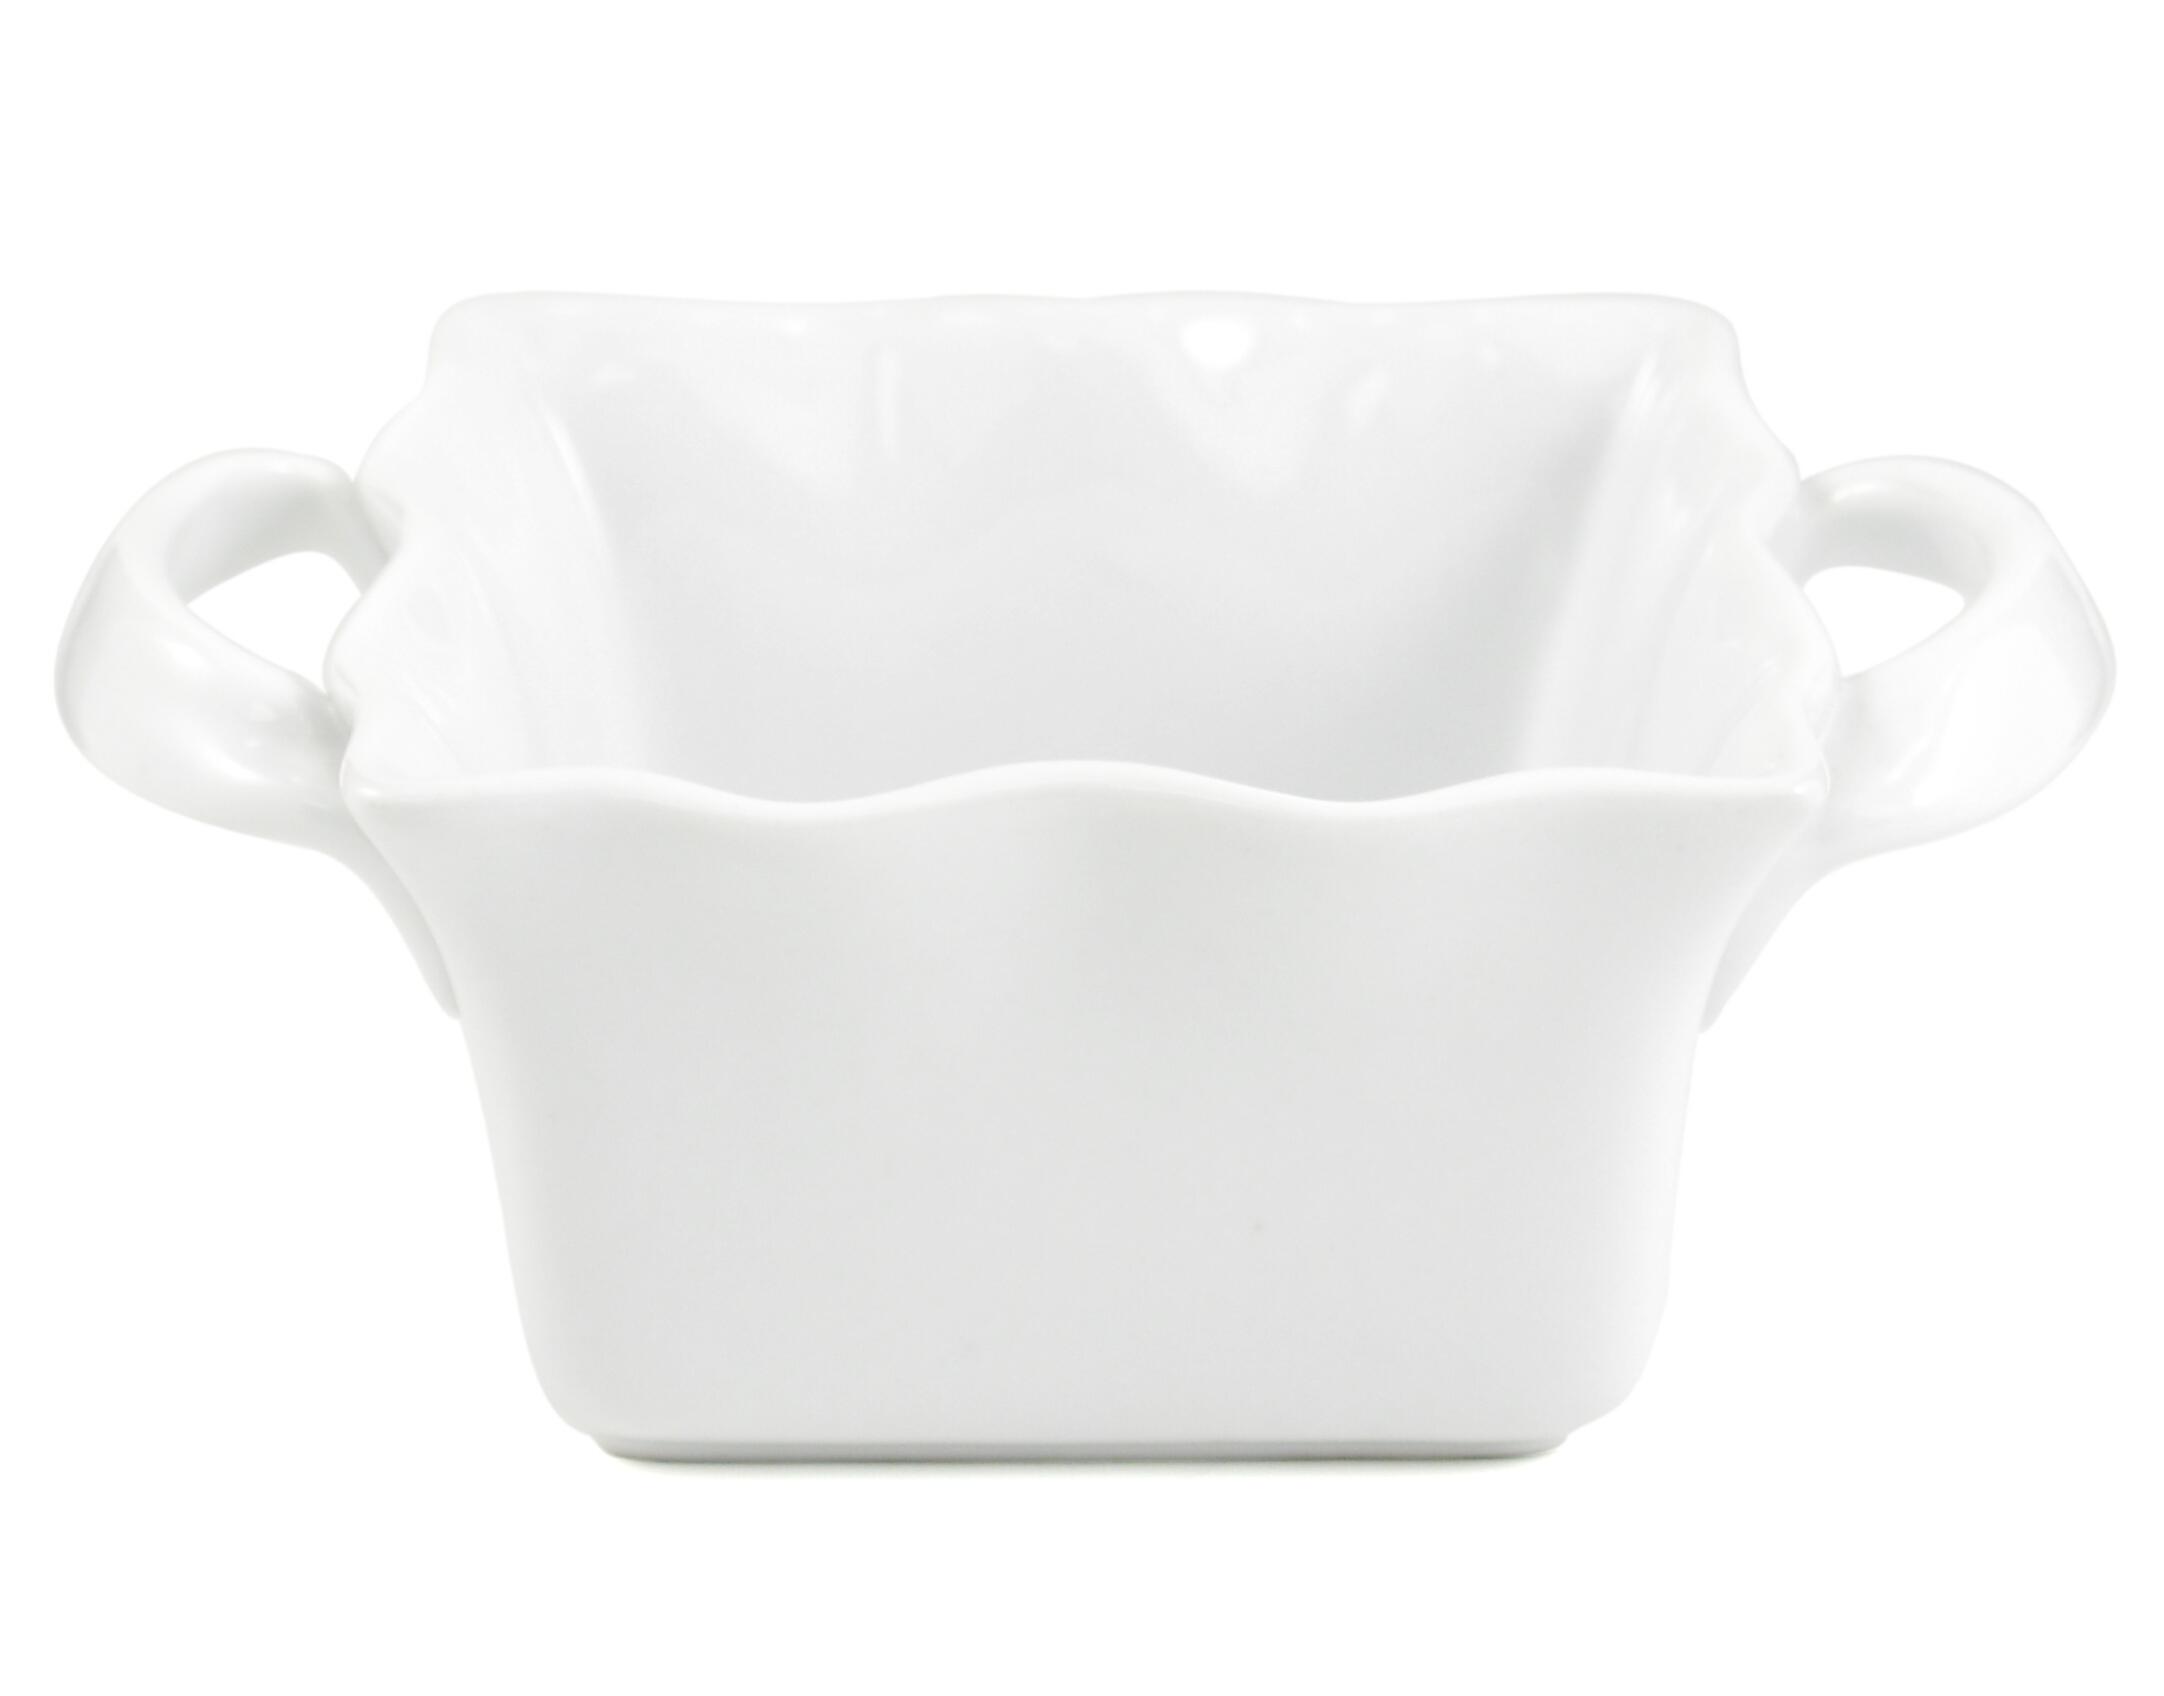 BIA Cordon Bleu Porcelain Wavy Square Baking Dish, 16 Ounce